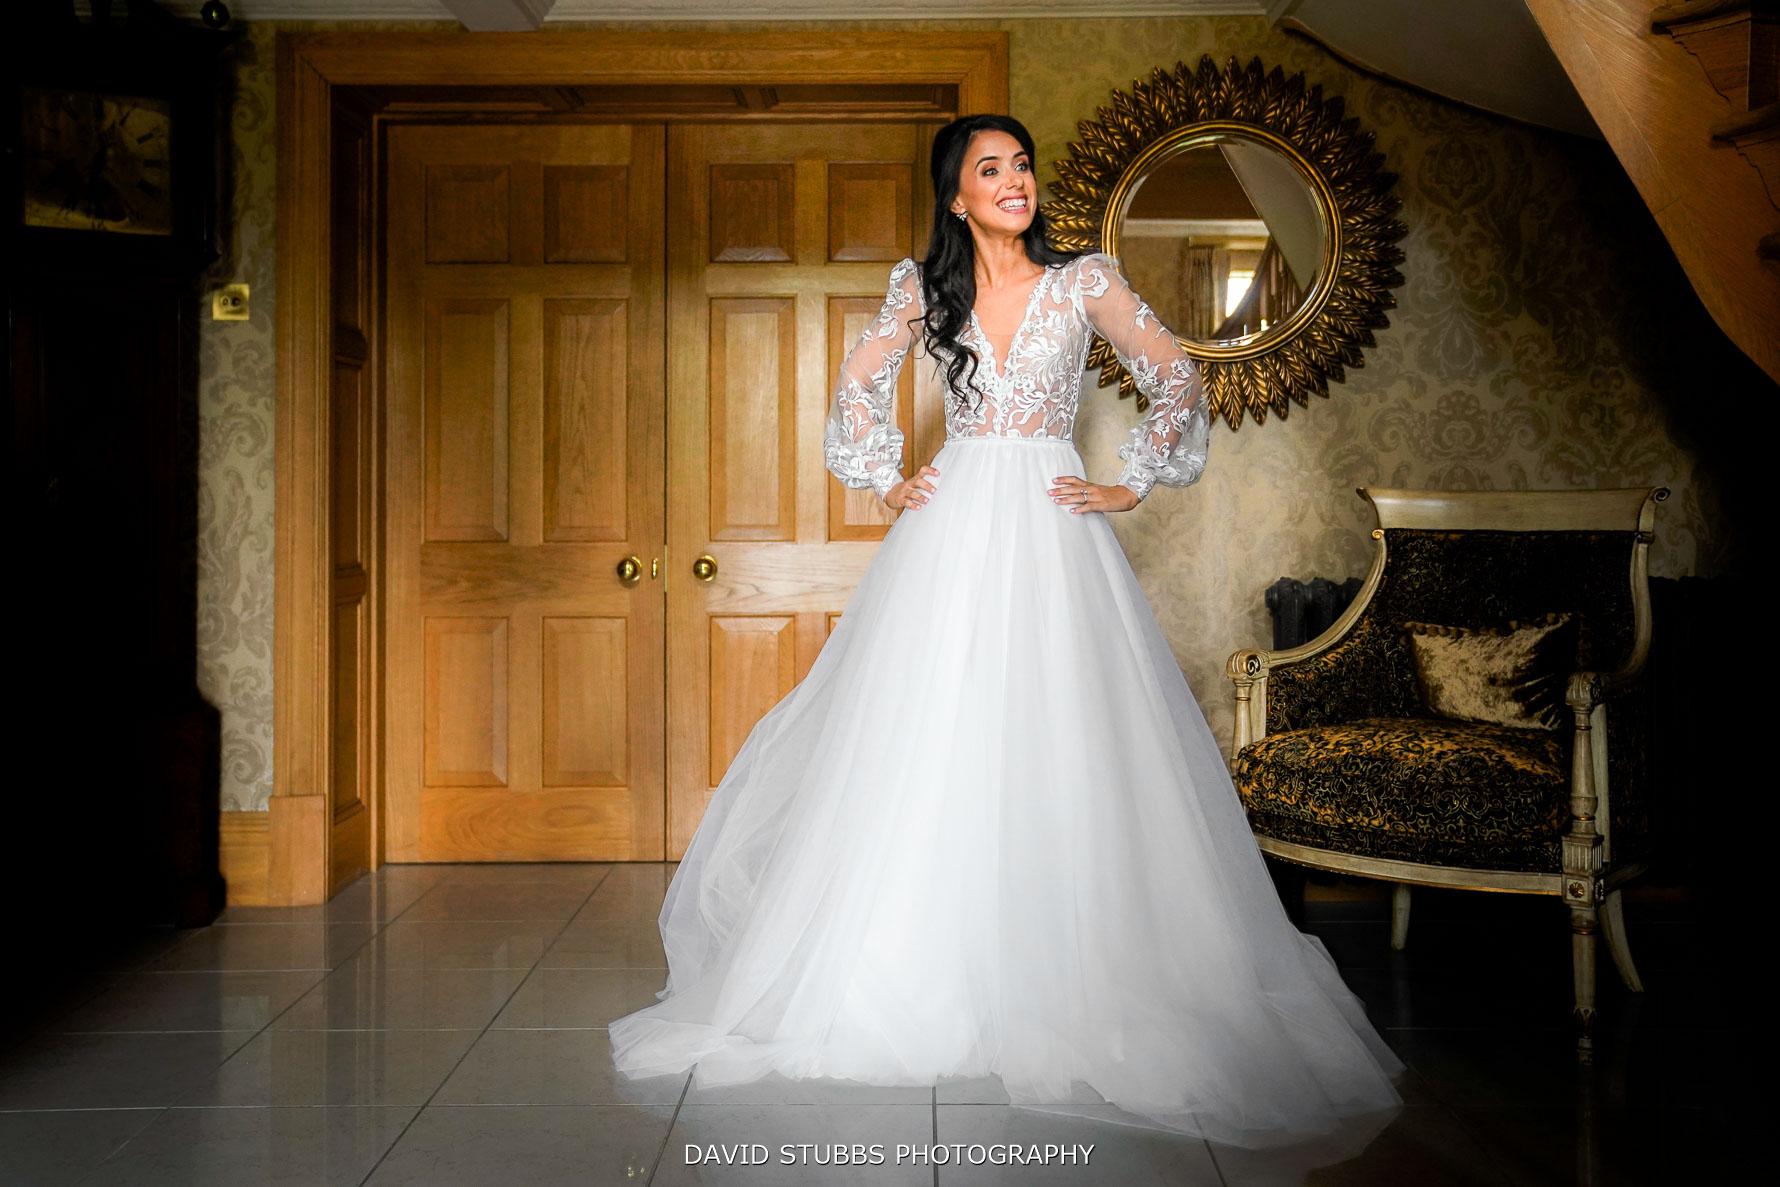 rachel the bride anticipates the day ahead